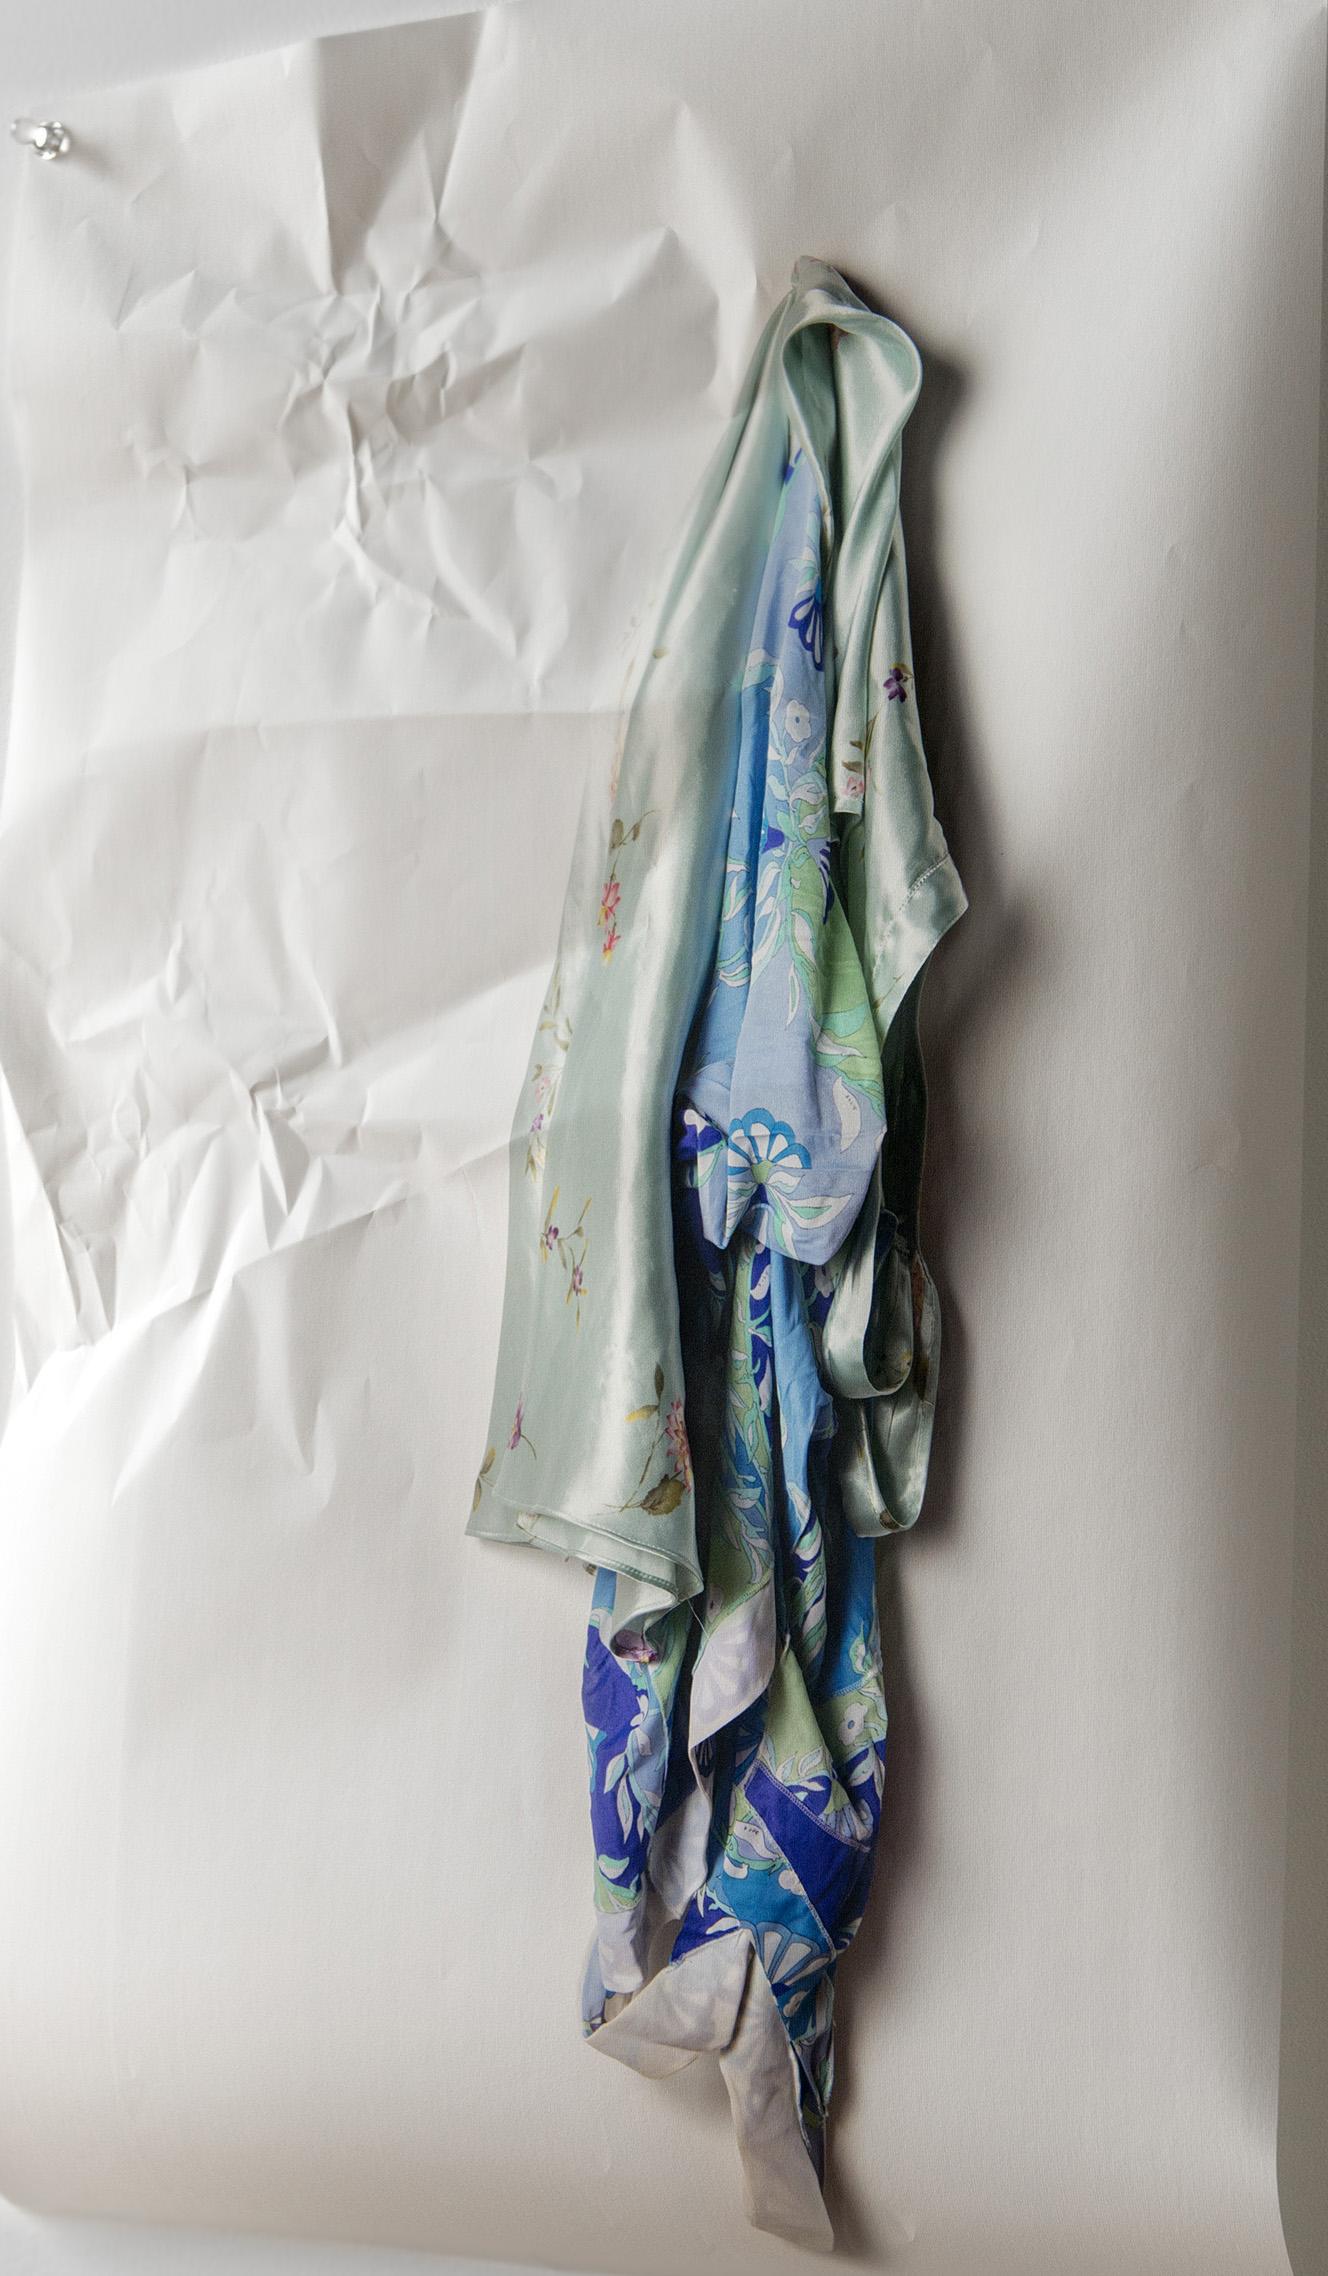 Nancy Hellebrand in collaboration with Shira Yudkoff